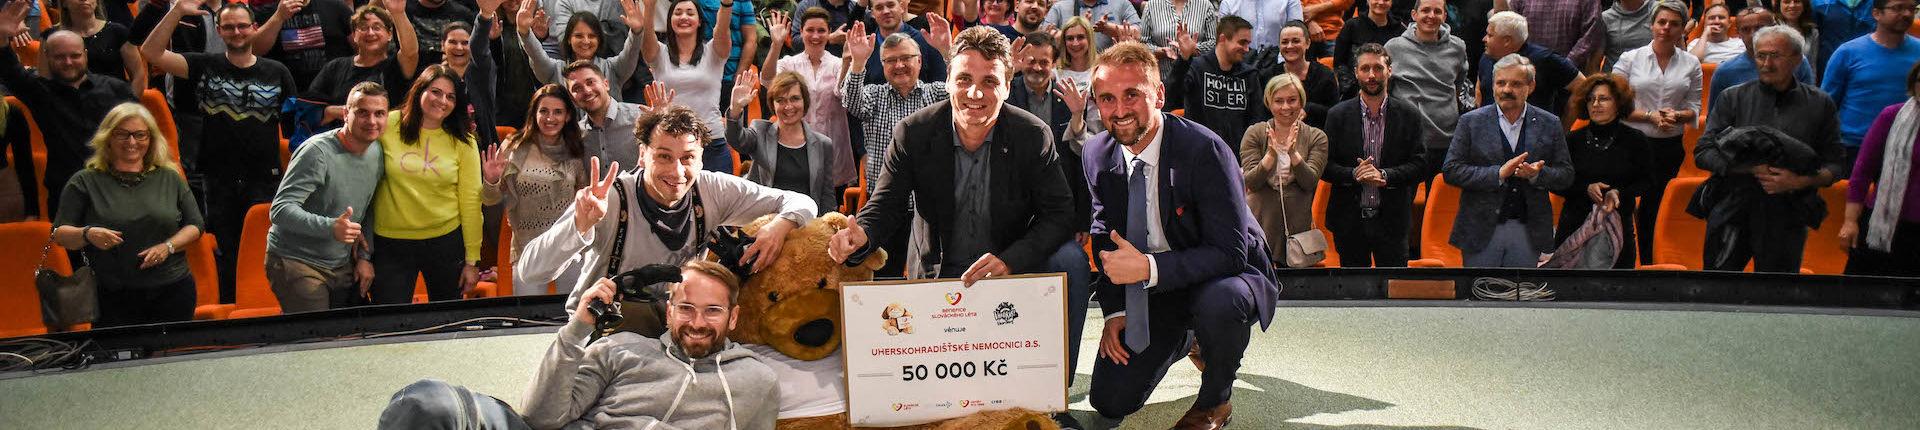 Vandráci okouzlili publikum, nemocnice získaly 100 tisíc korun